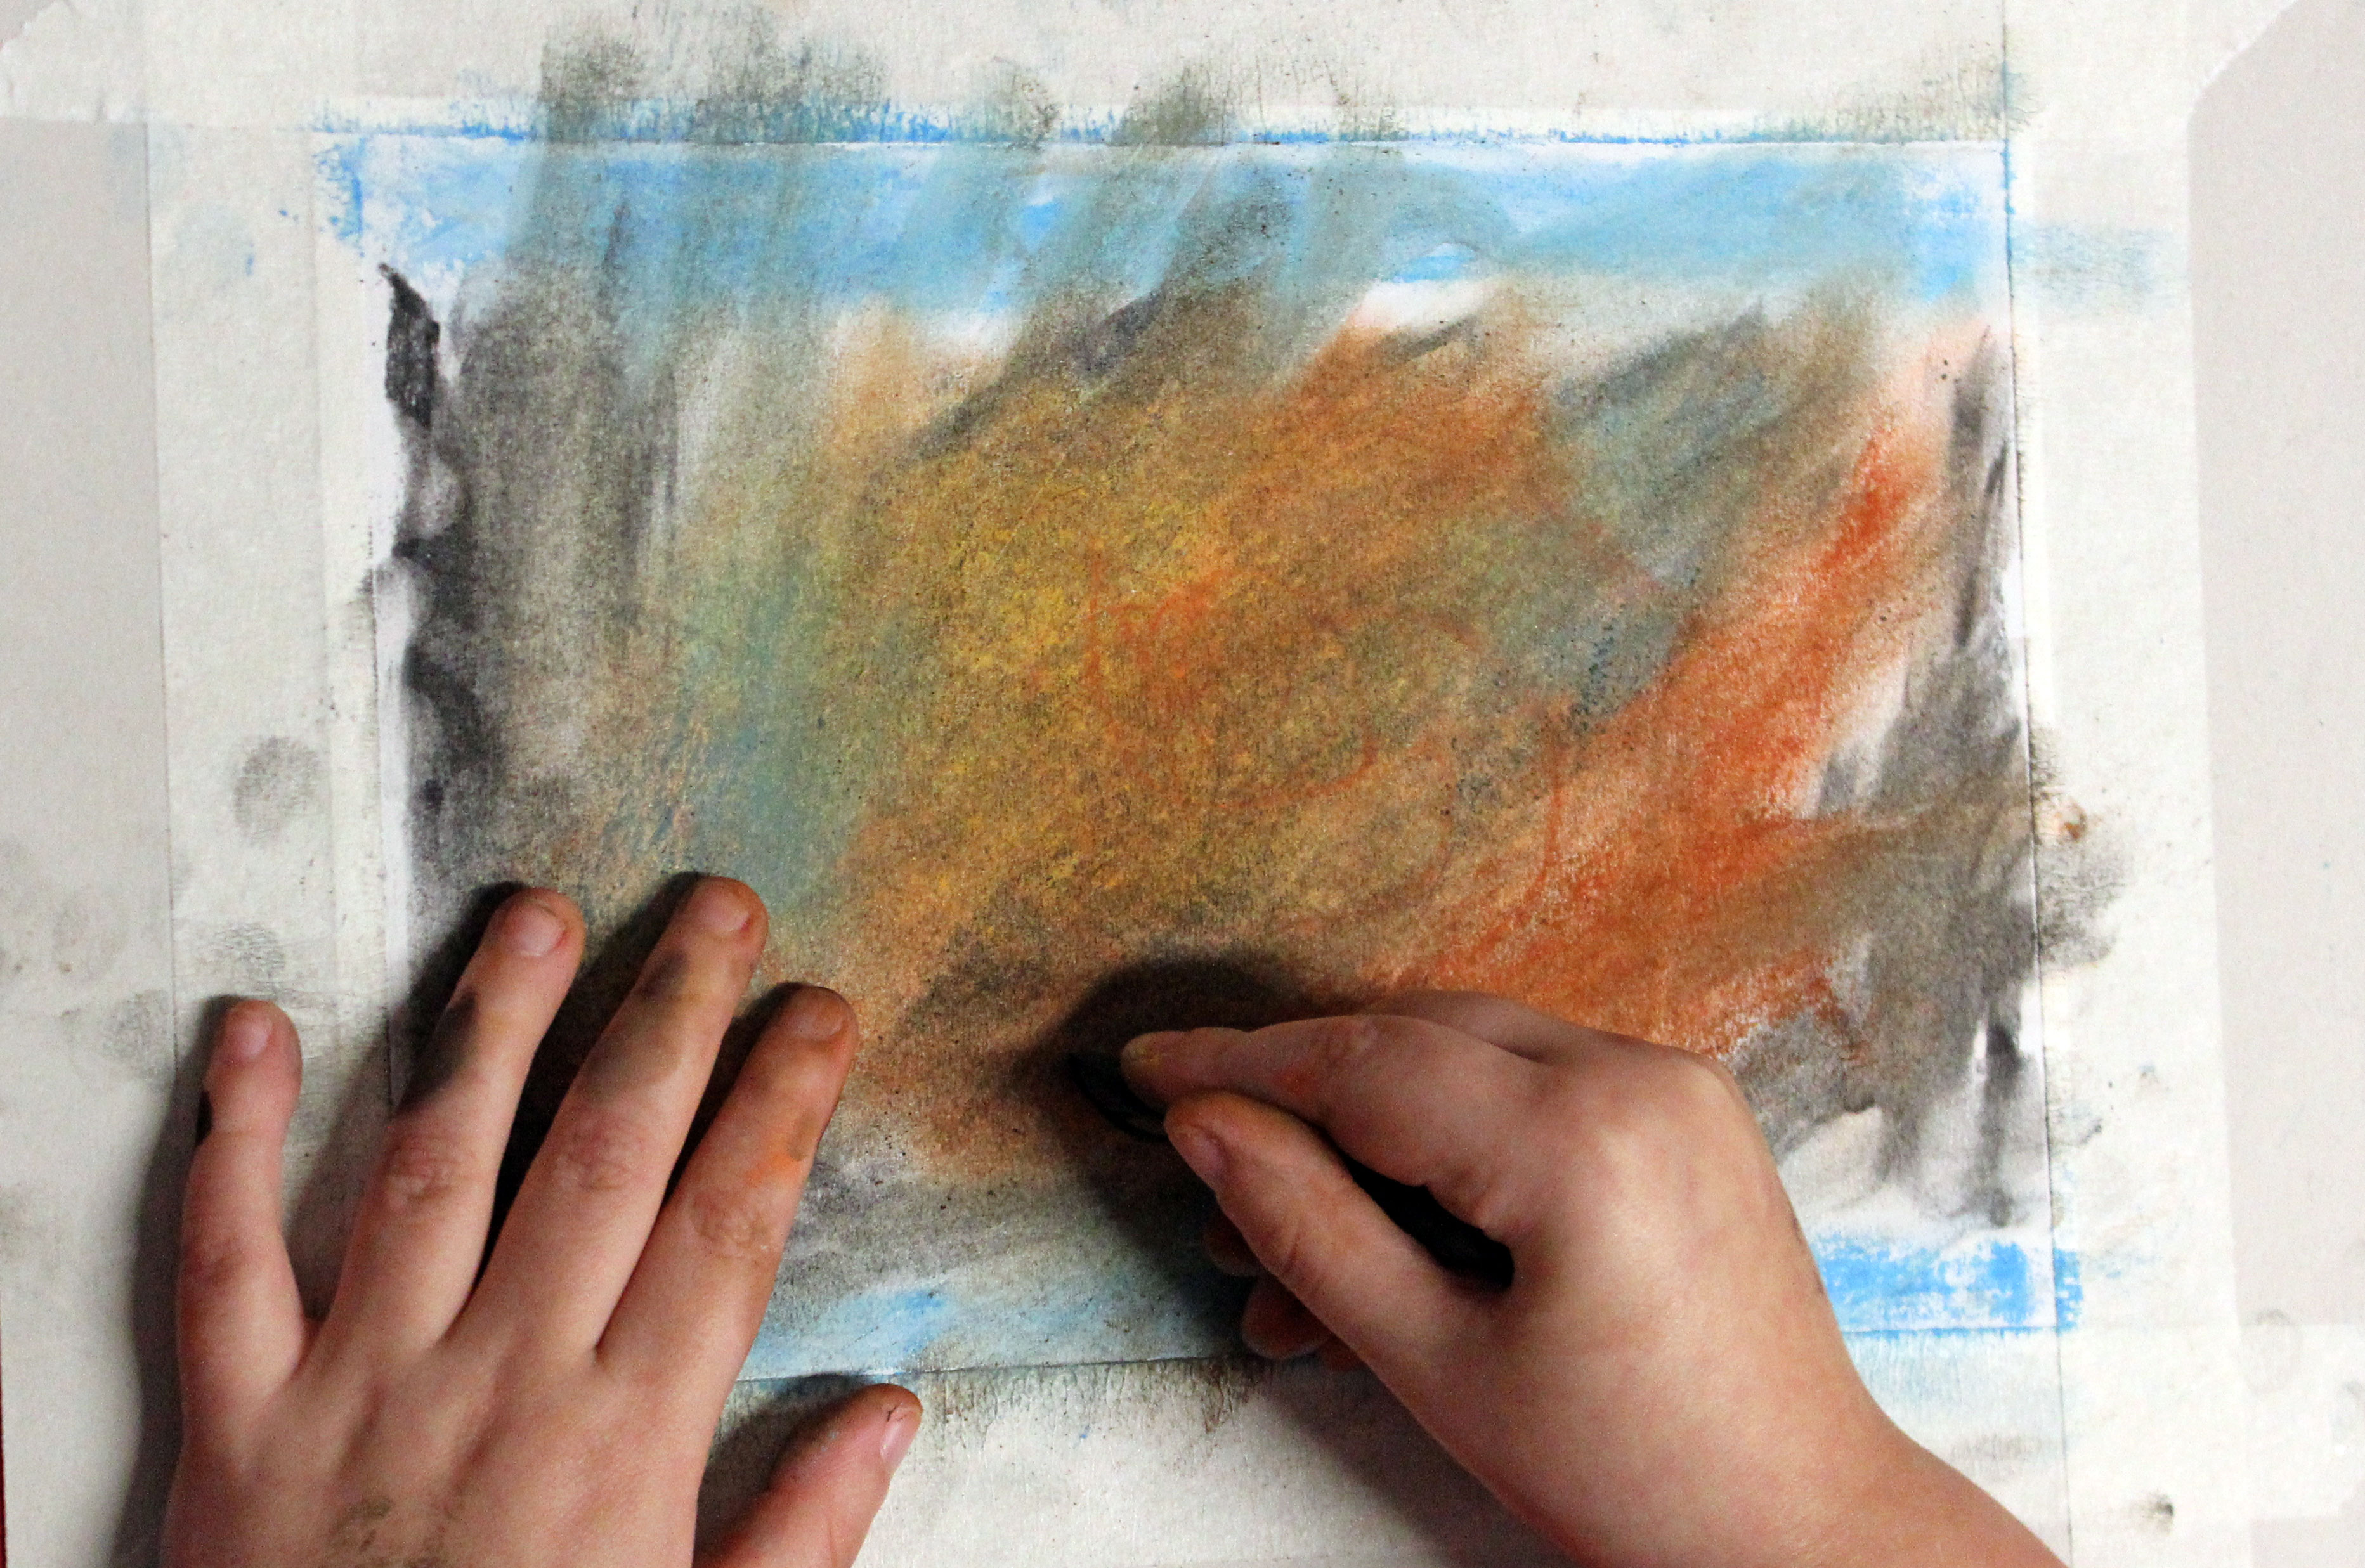 Turner Art